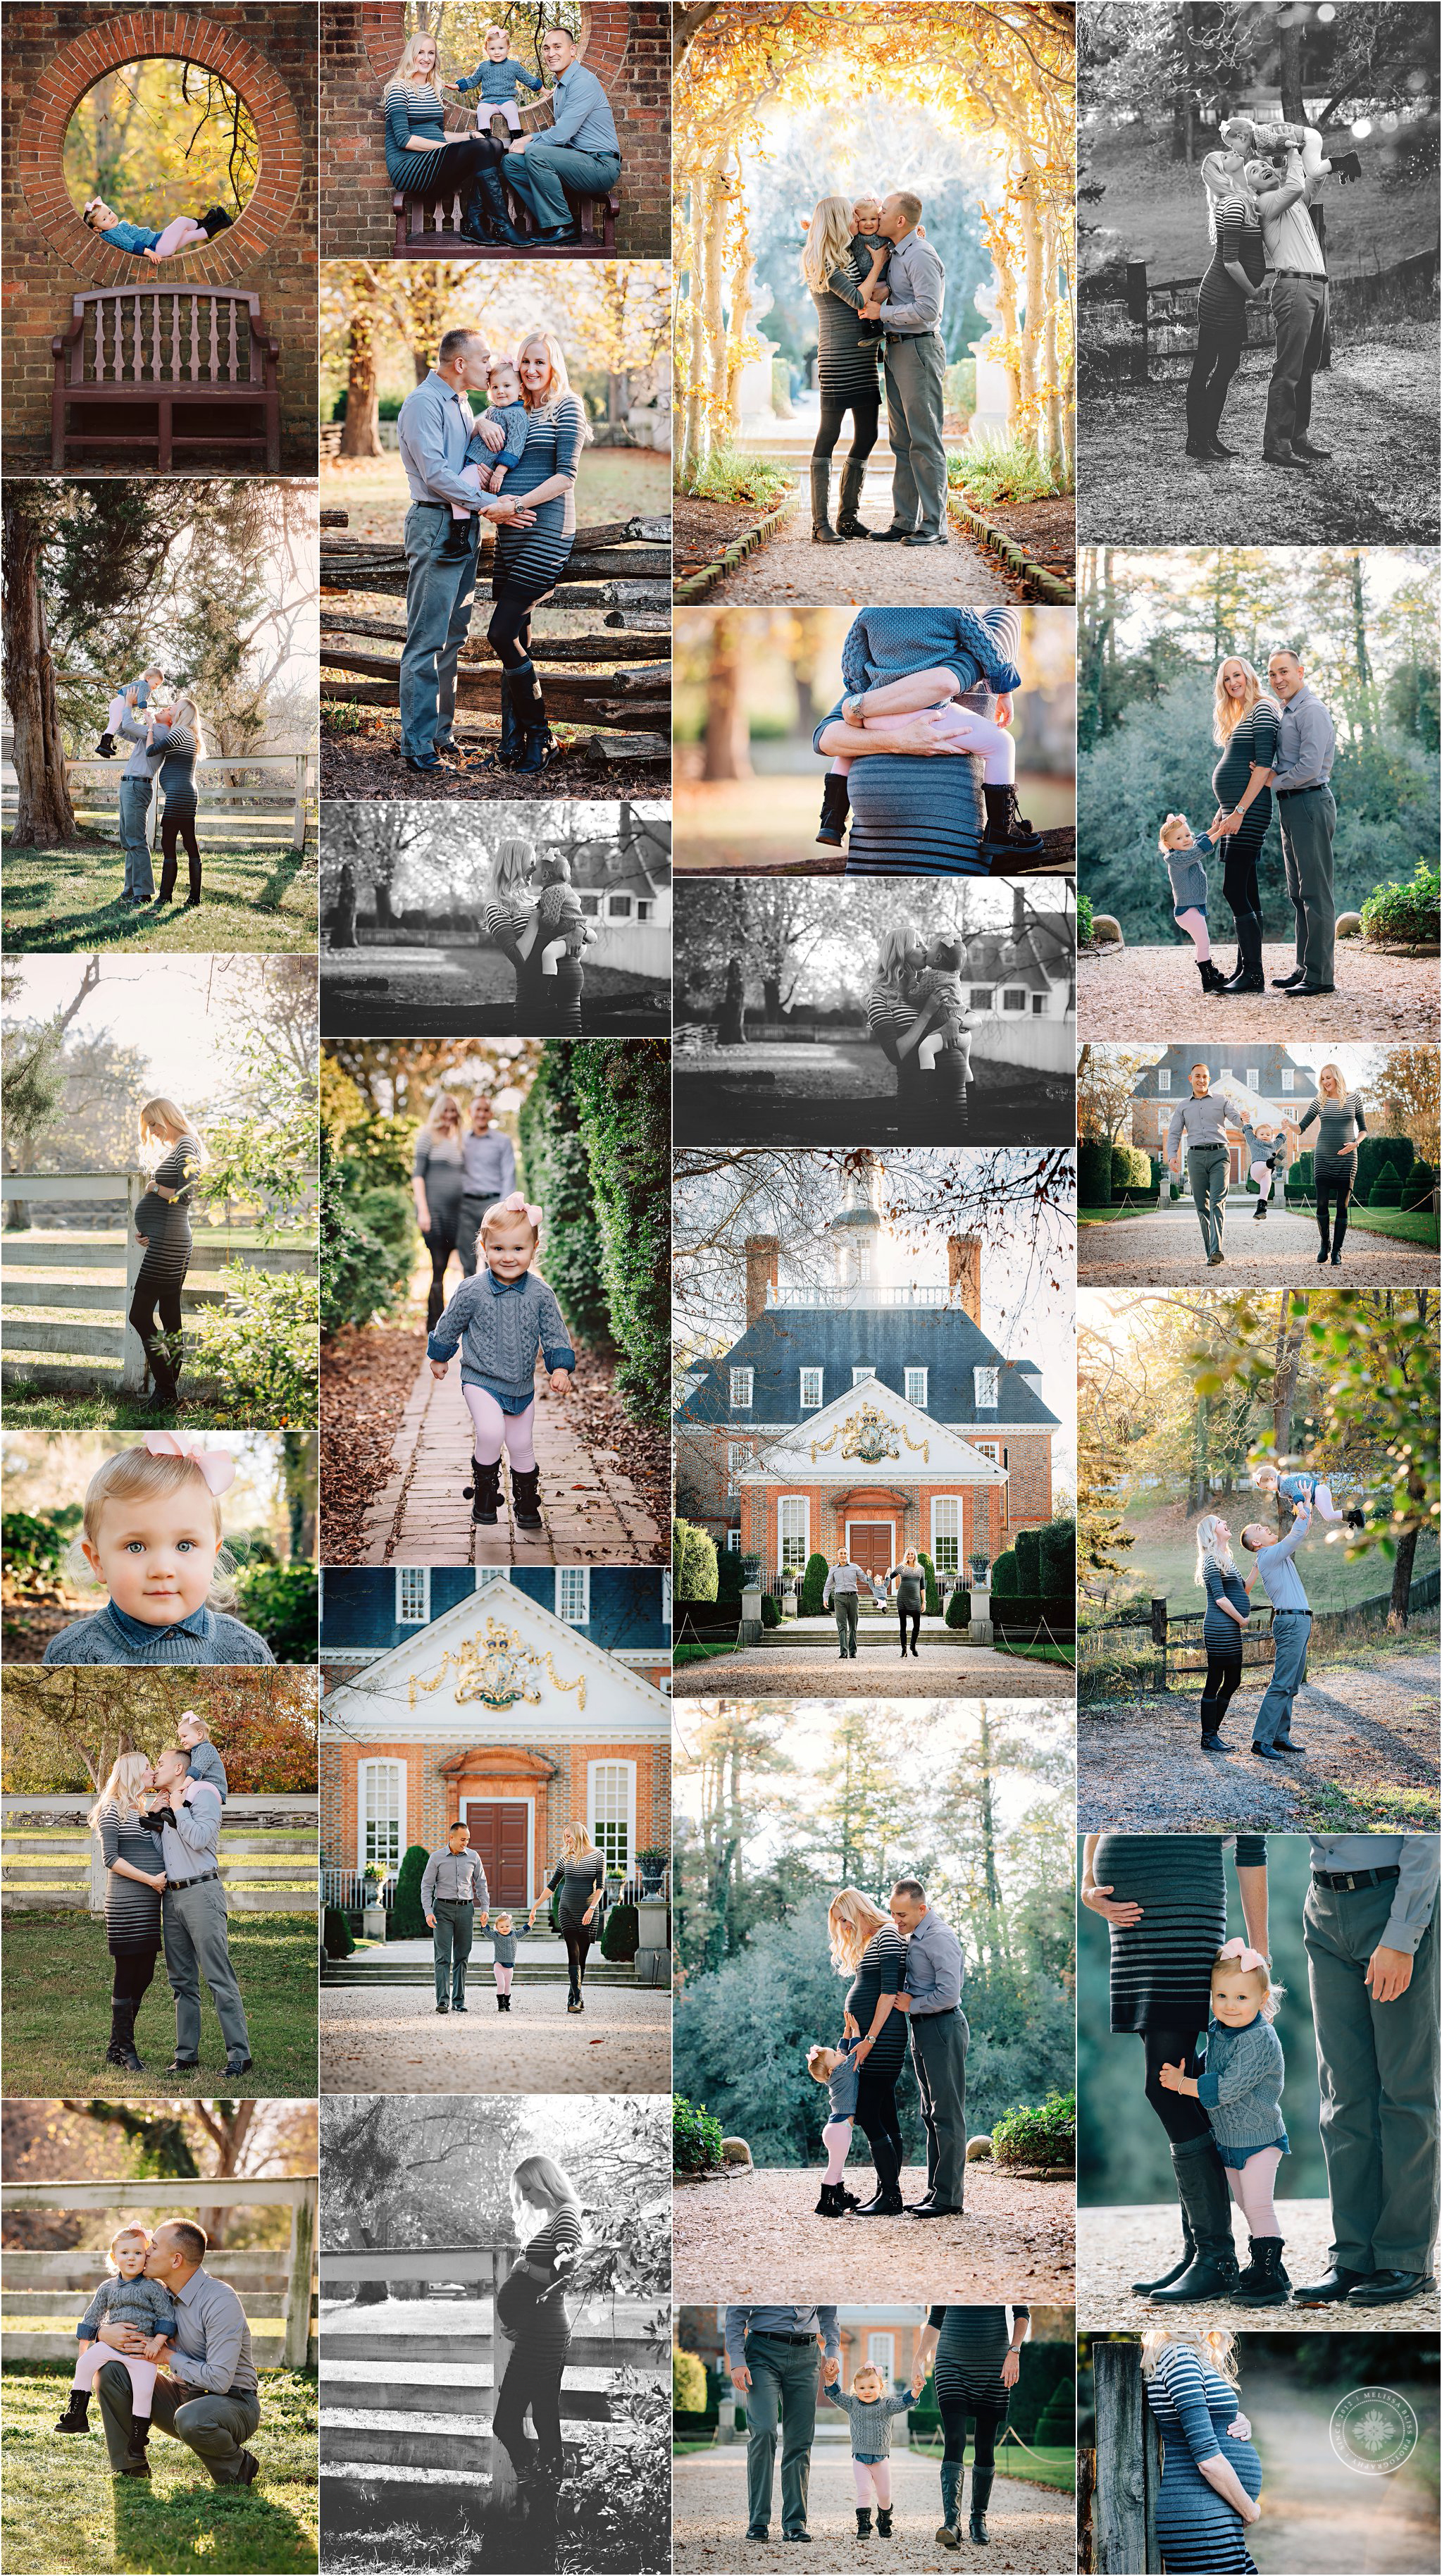 maternity-photography-maternity-posing-family-maternity-session-williamsburg-va-fall-photo-session-ideas-maternity-portraits